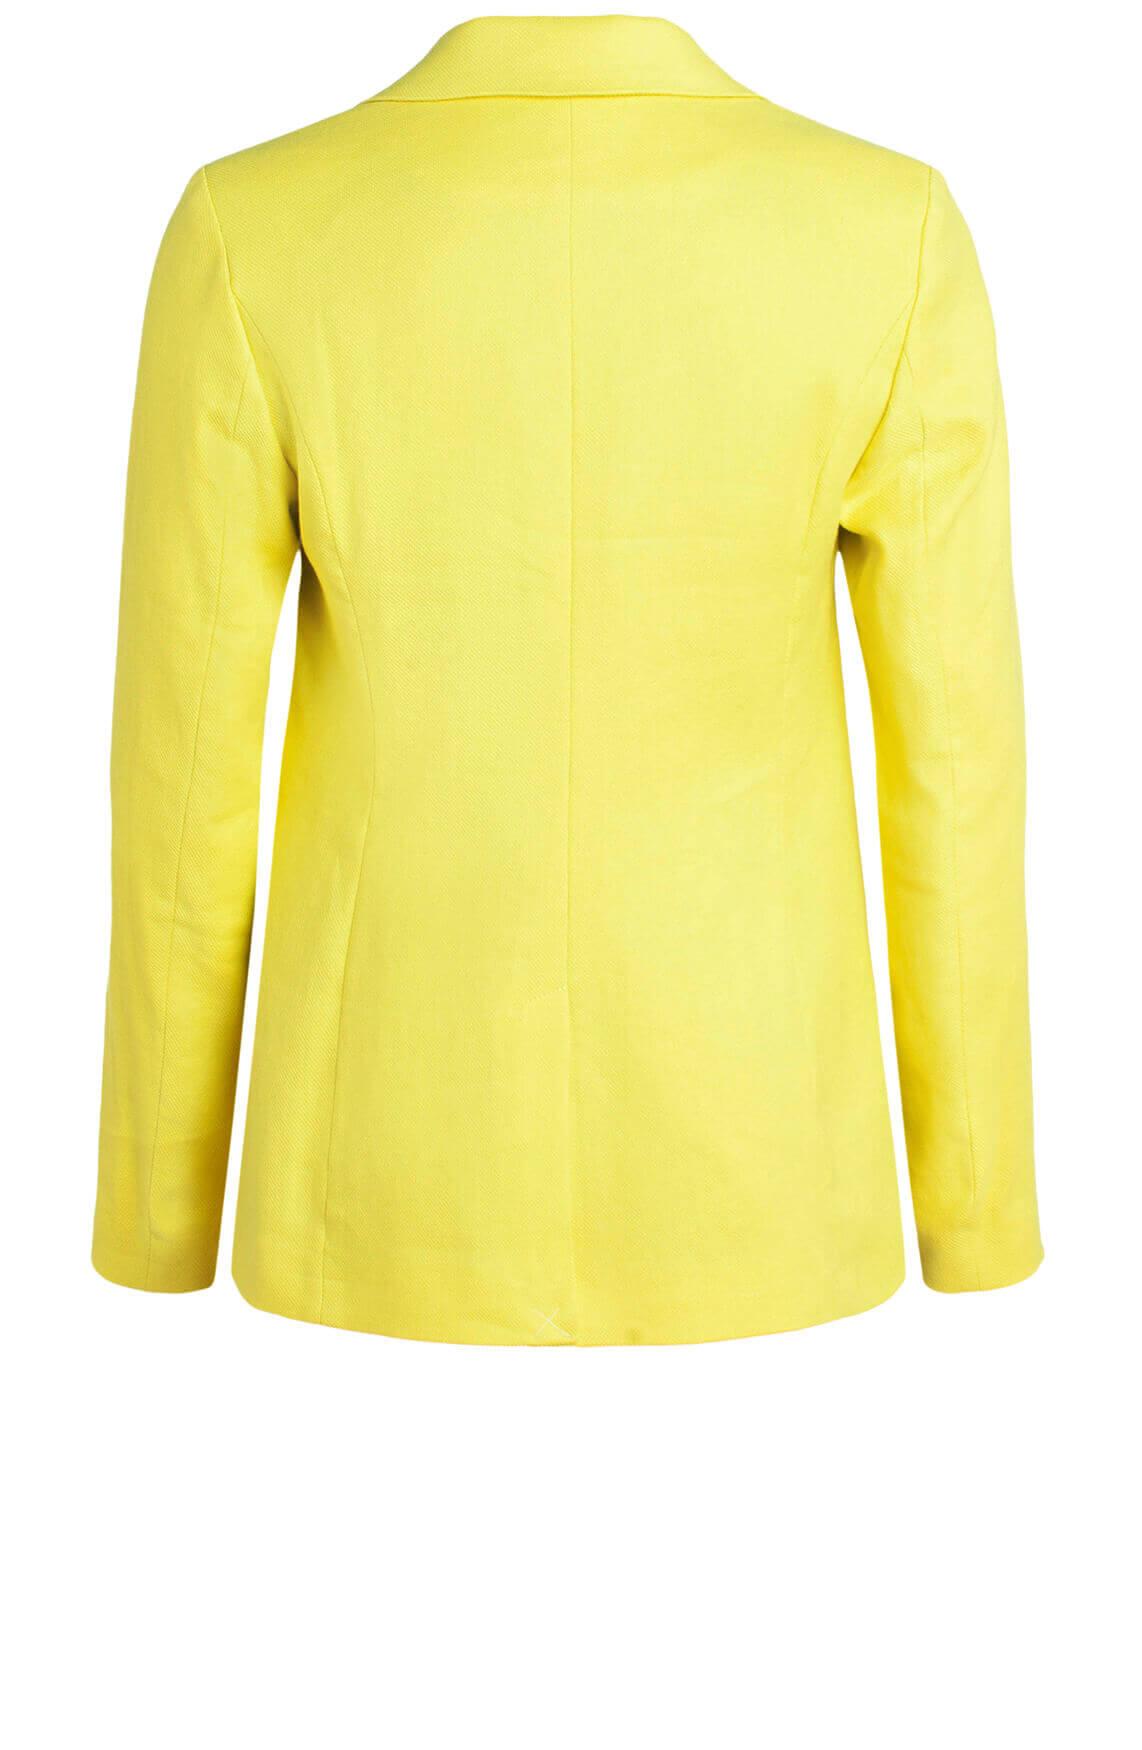 Anna Dames Blazer met linnen geel